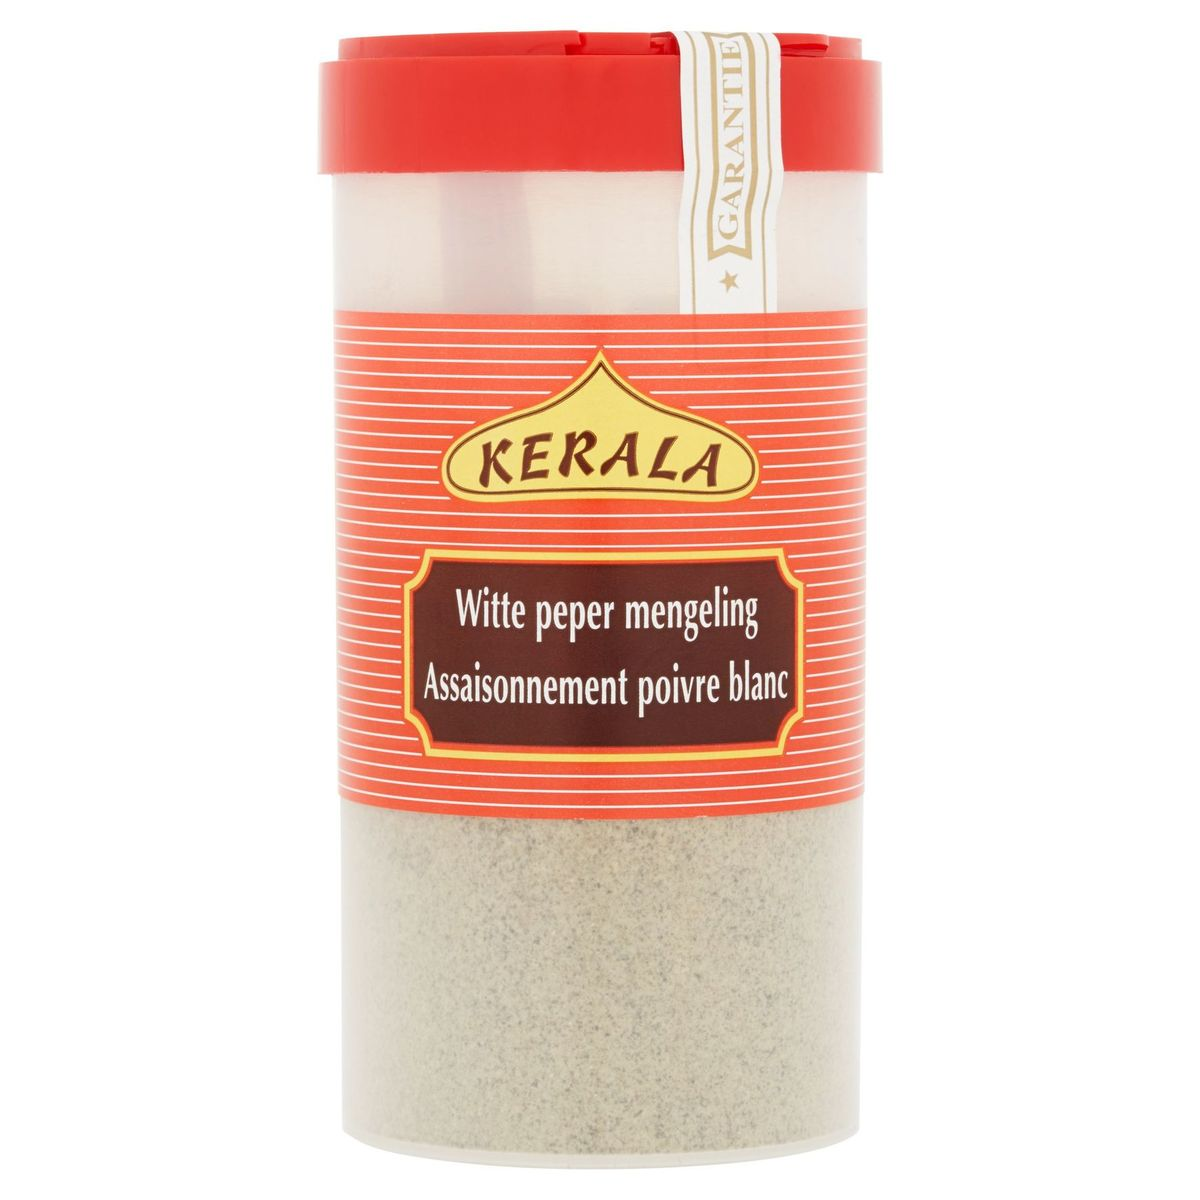 Kerala Witte Peper Mengeling 100 g